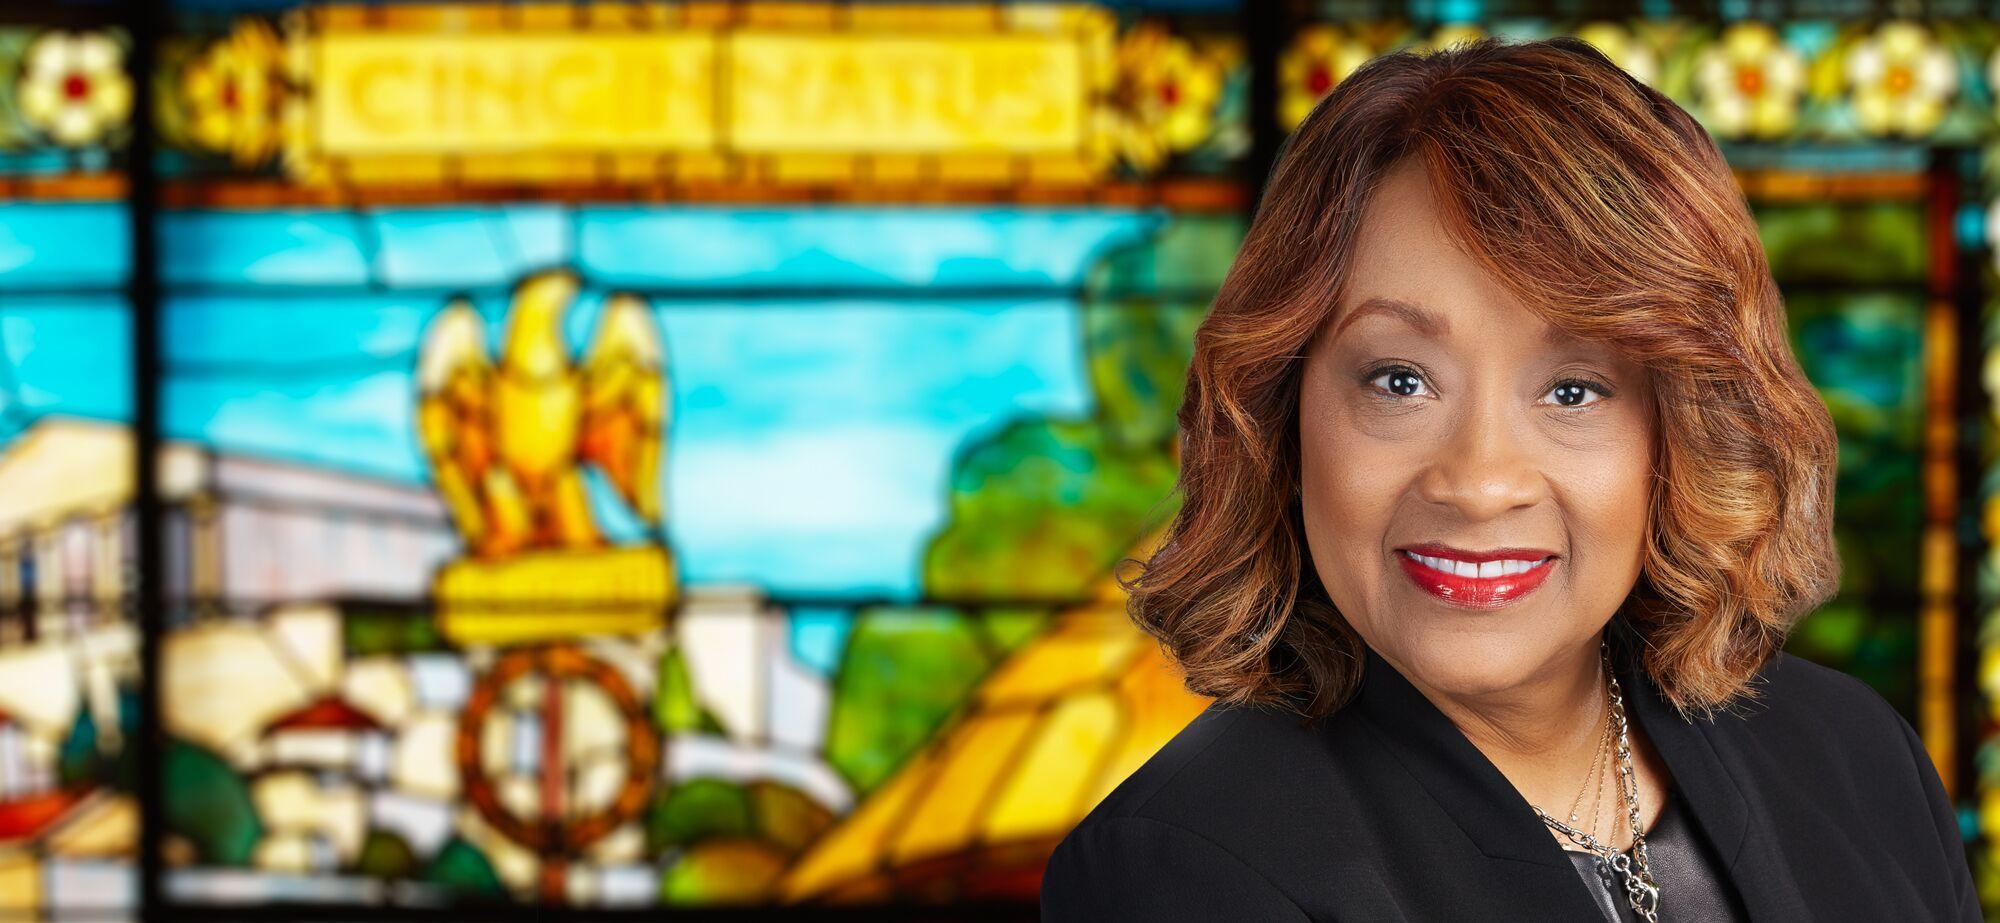 COVID-19 Leaders in Action: Melba Moore, Cincinnati Health Commissioner